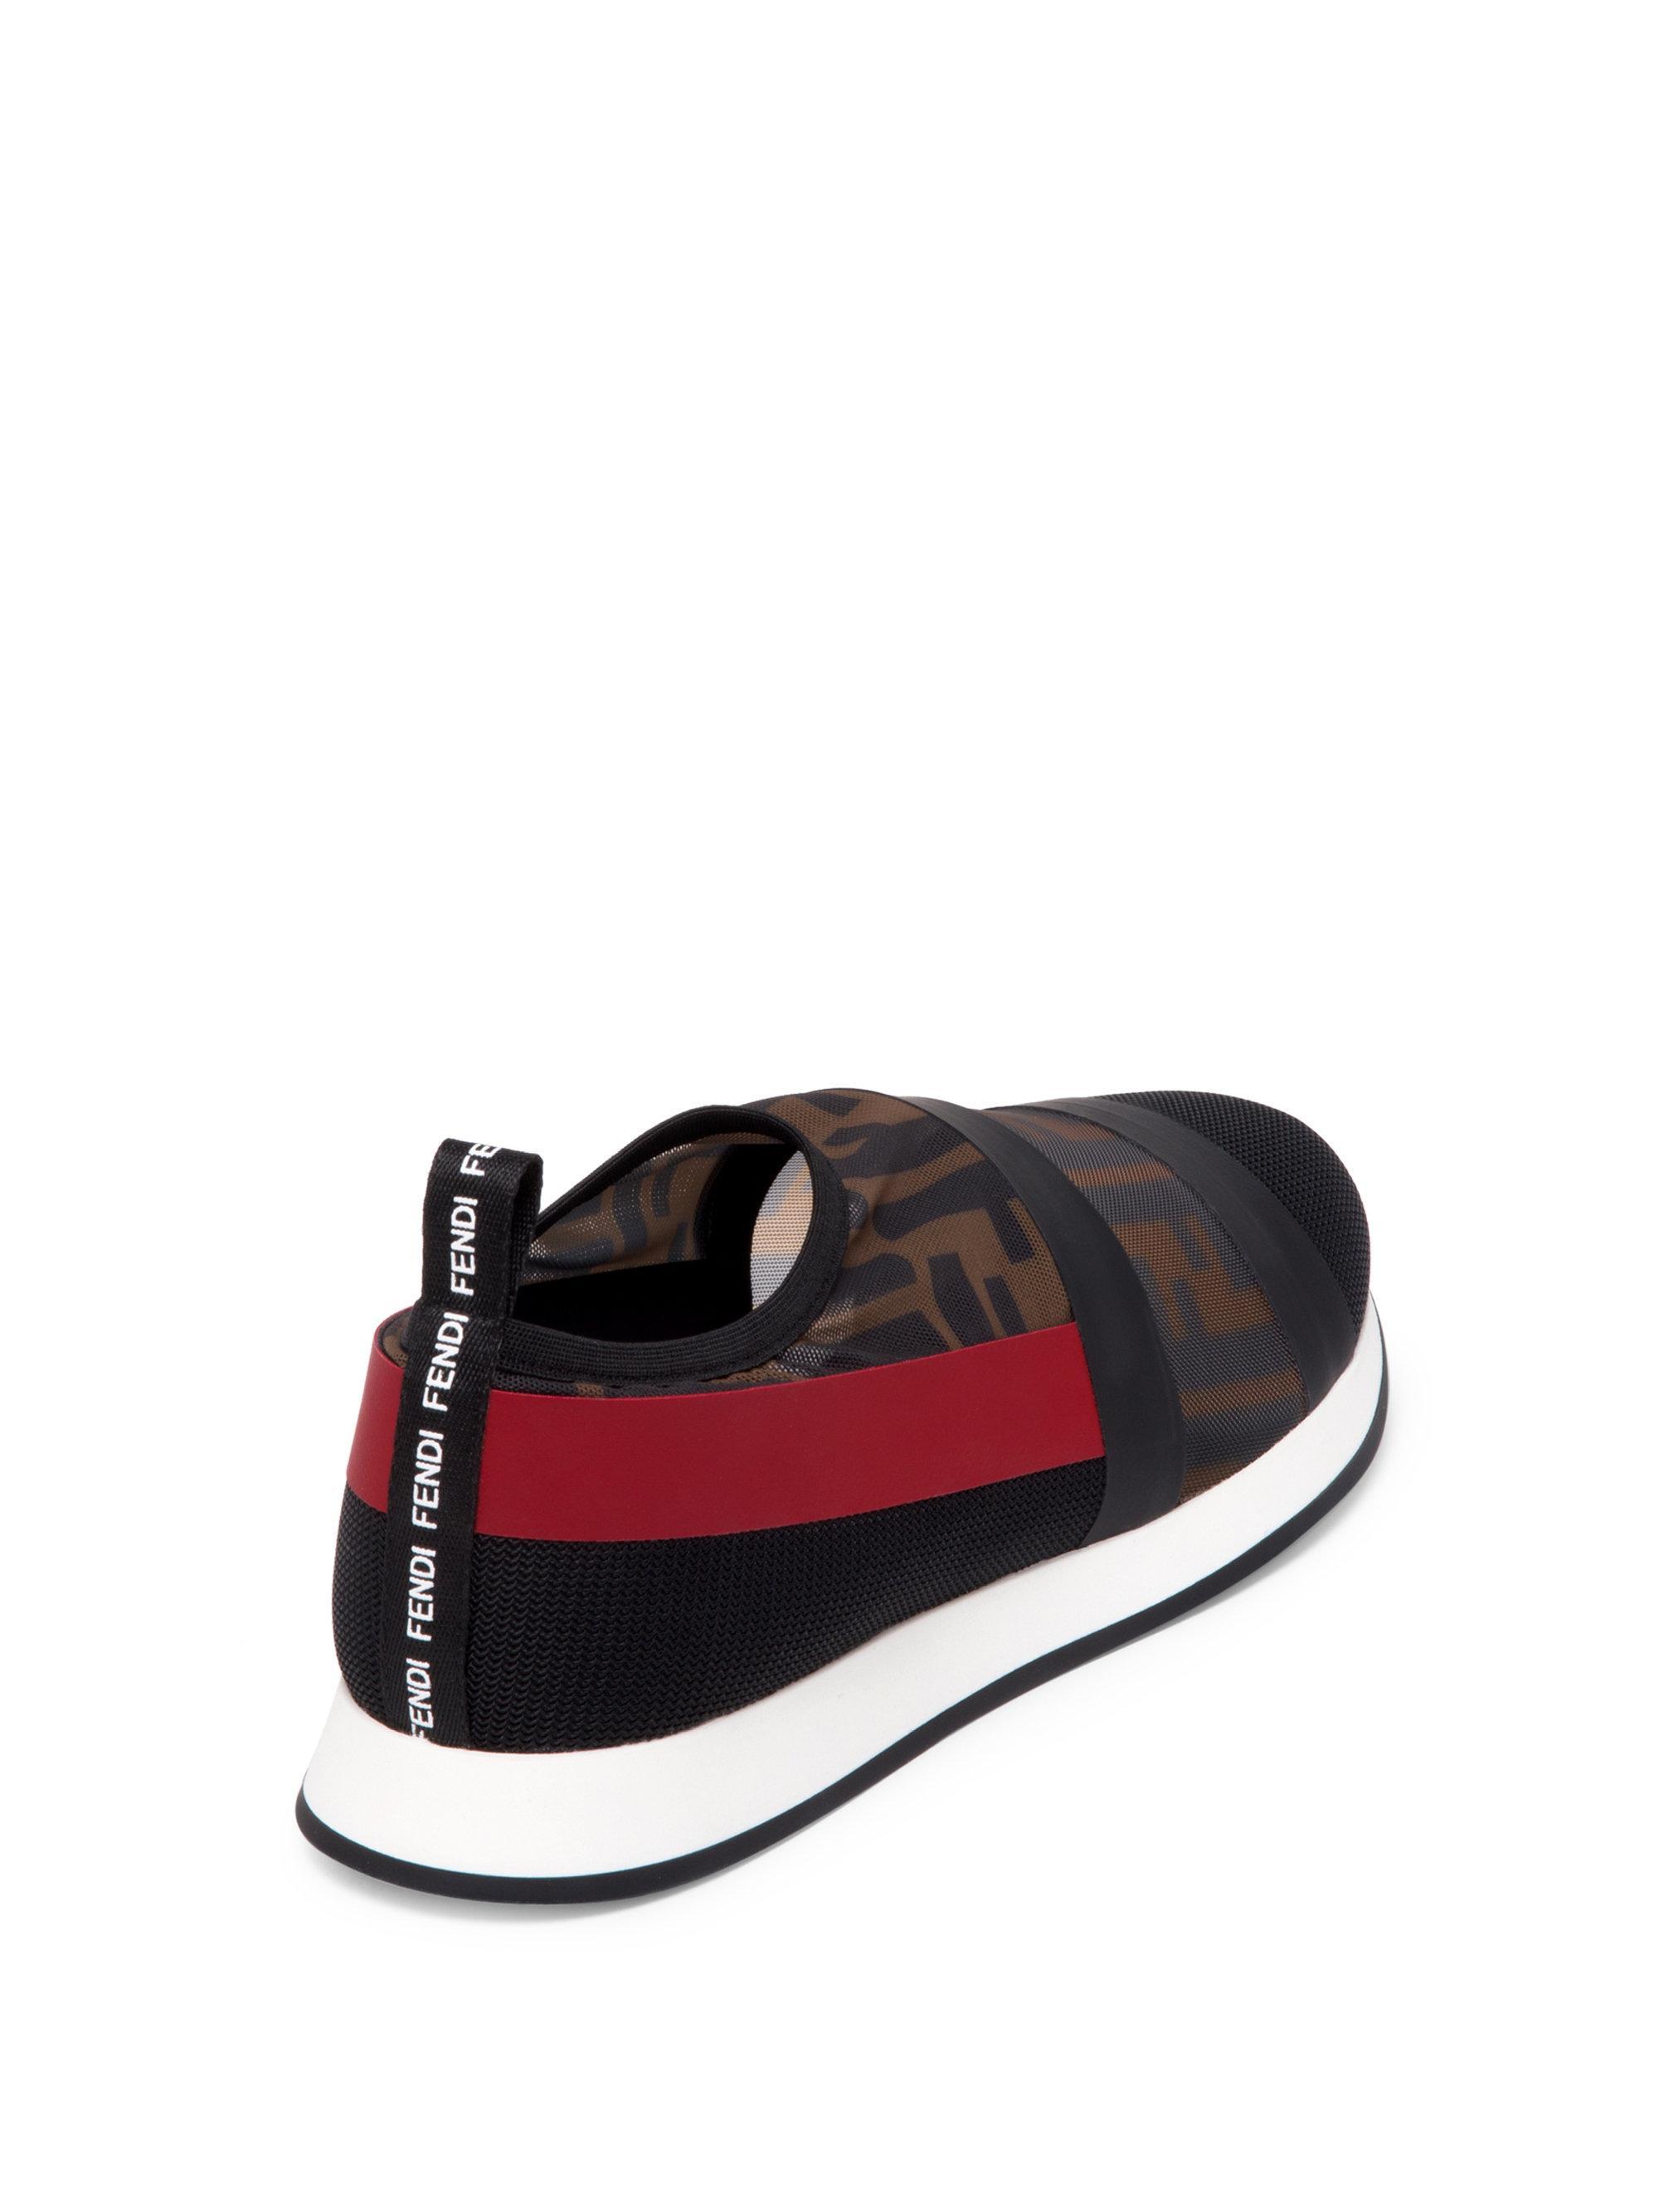 Fendi Logo Mesh Sneakers in Black - Lyst